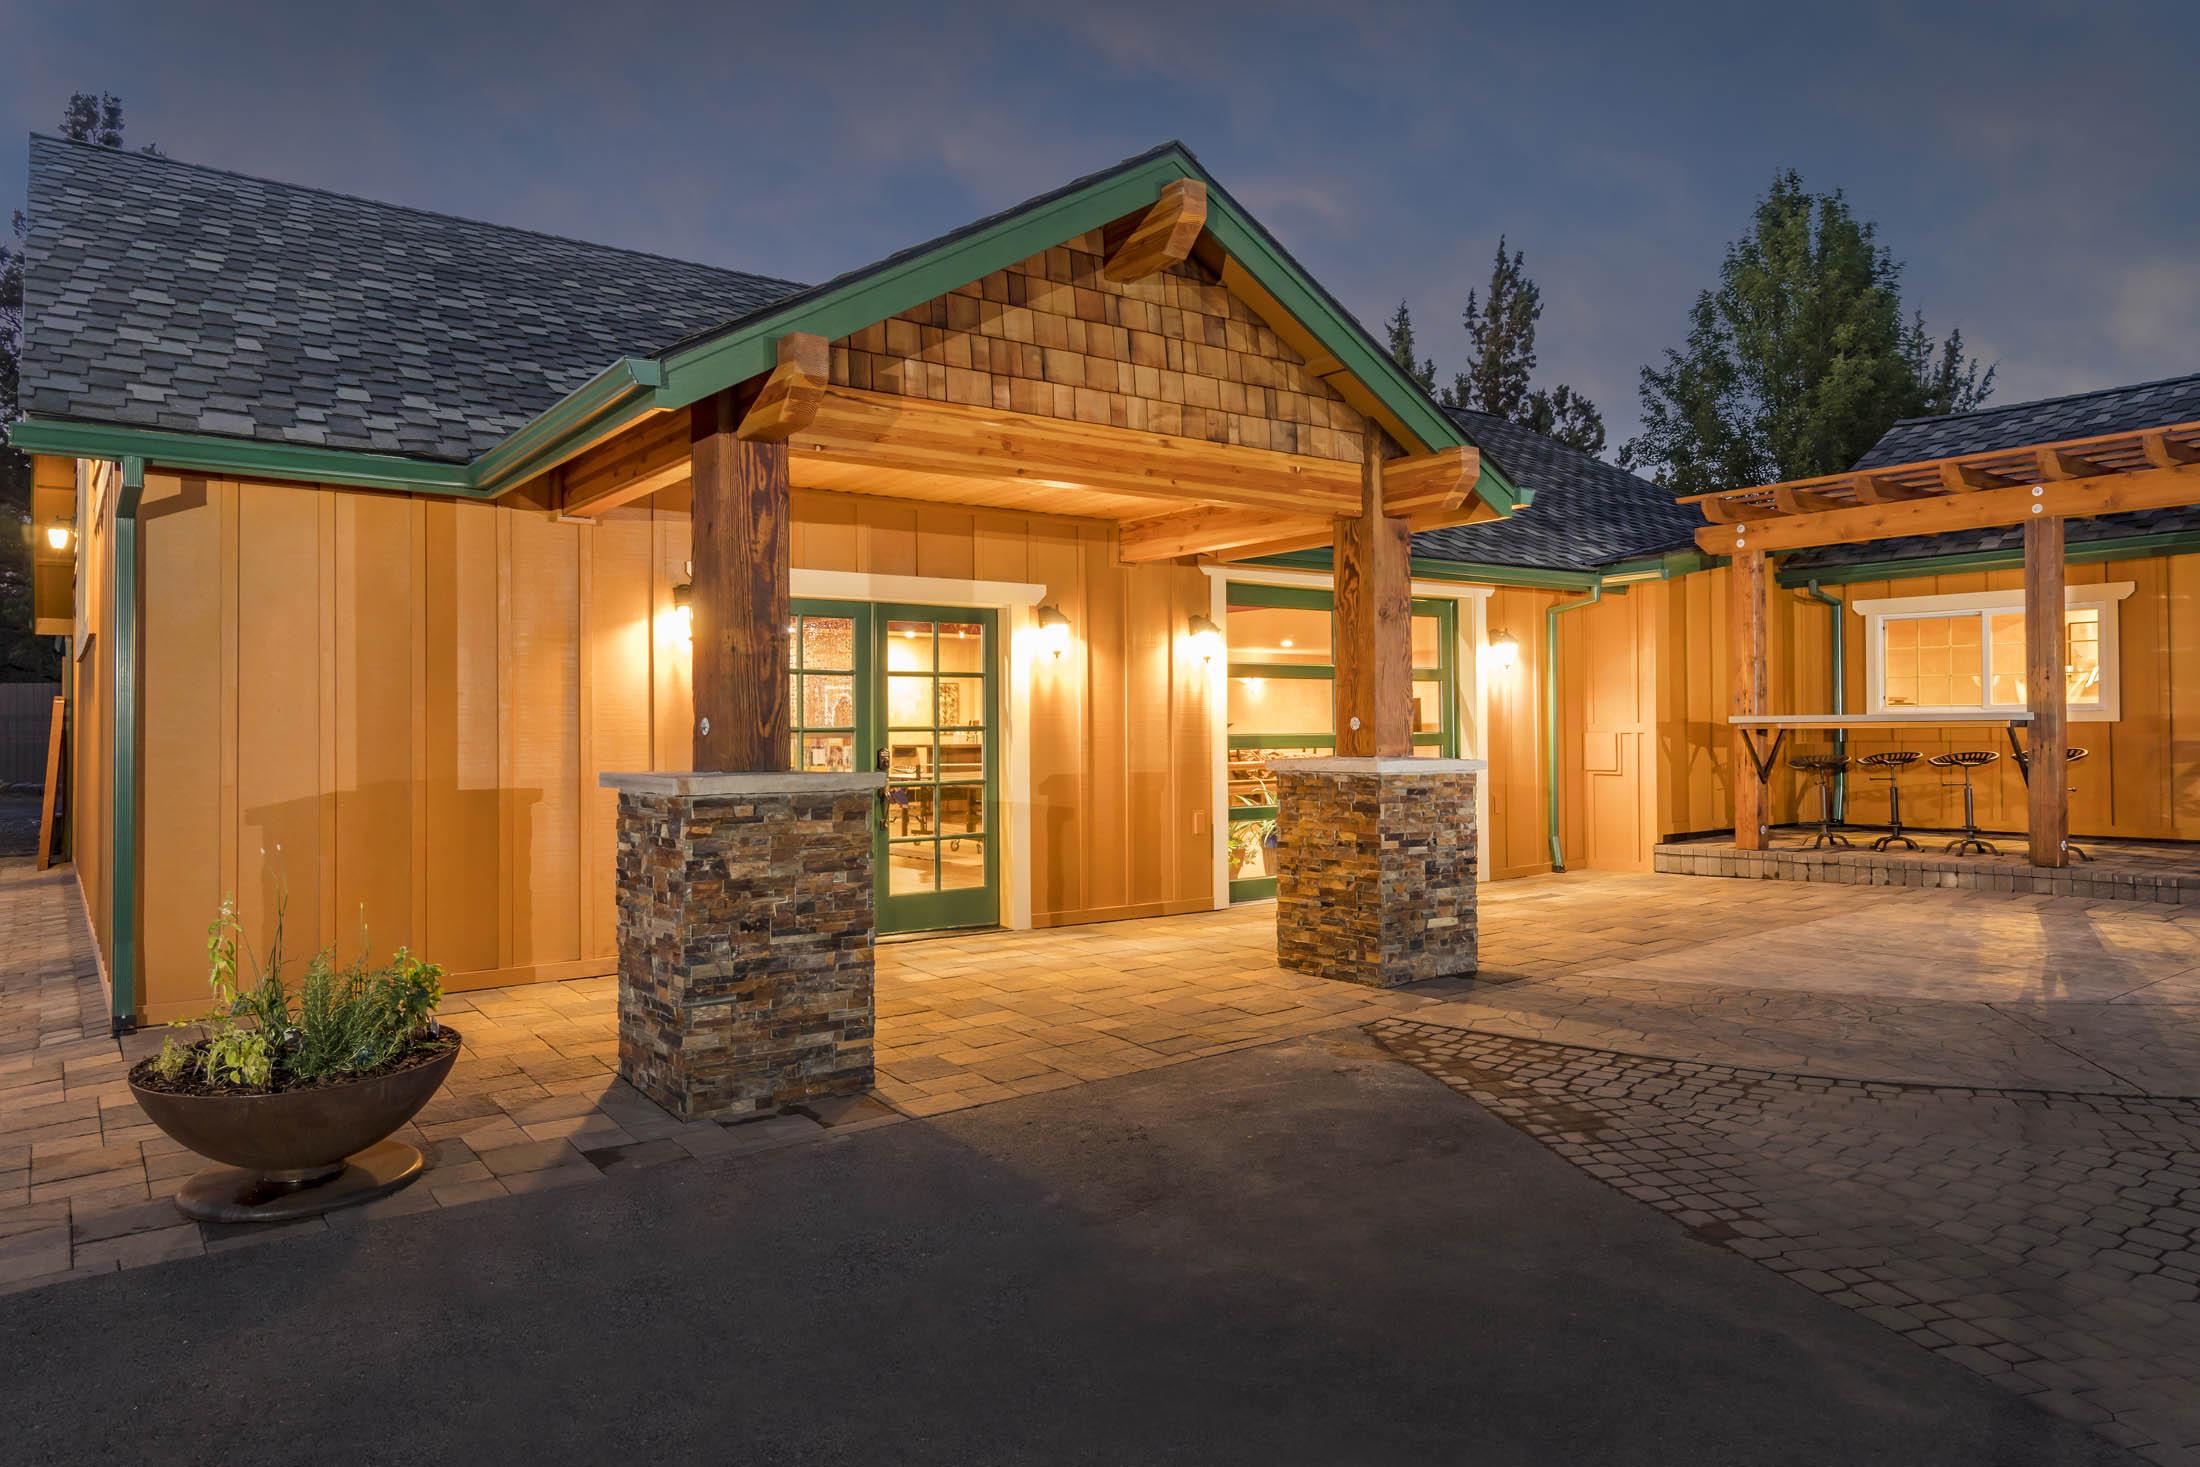 HOLLYMAN DESIGN | Architectural design services include: Custom Home Design